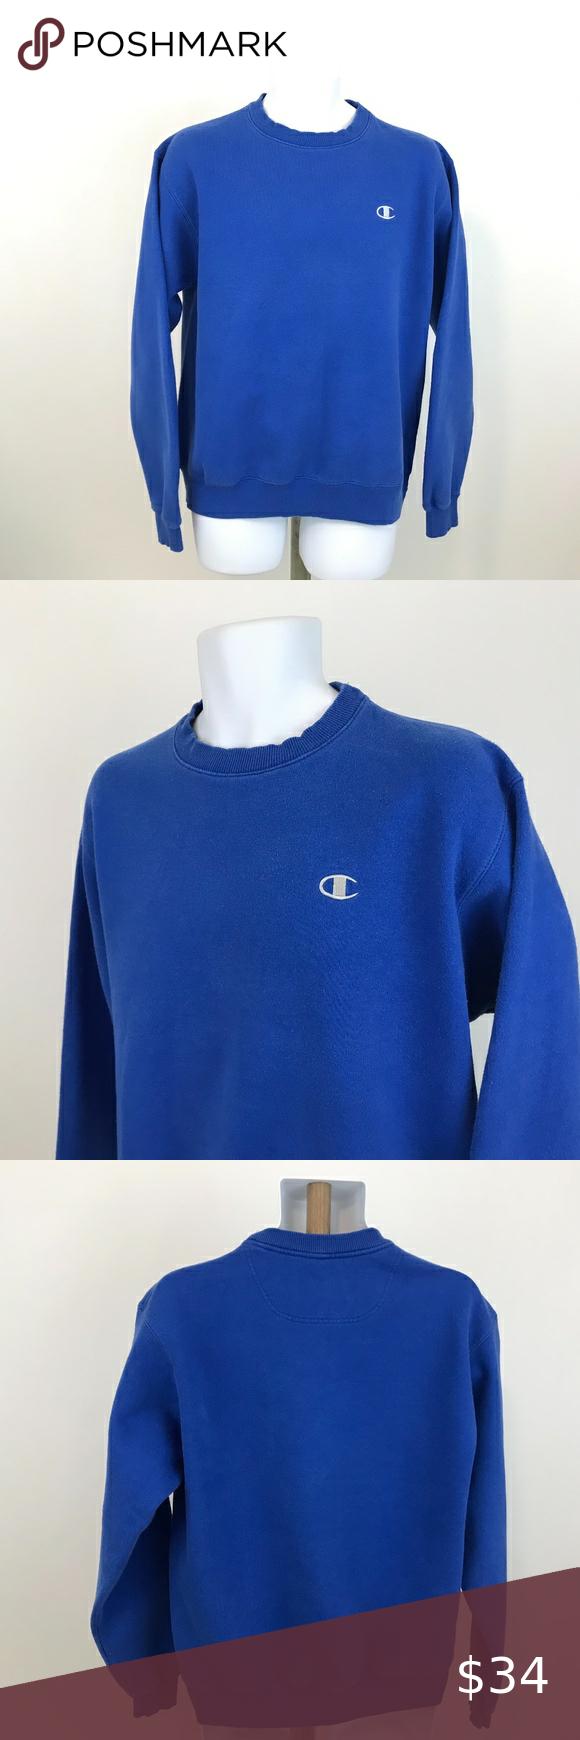 90s Champion Eco Fleece Blue Sweatshirt Size M Vintage 90s Champion Eco Fleece Sweatshirt Men S Size M Stitc In 2020 Sweatshirts Blue Sweatshirt Sweatshirt Shirt [ 1740 x 580 Pixel ]